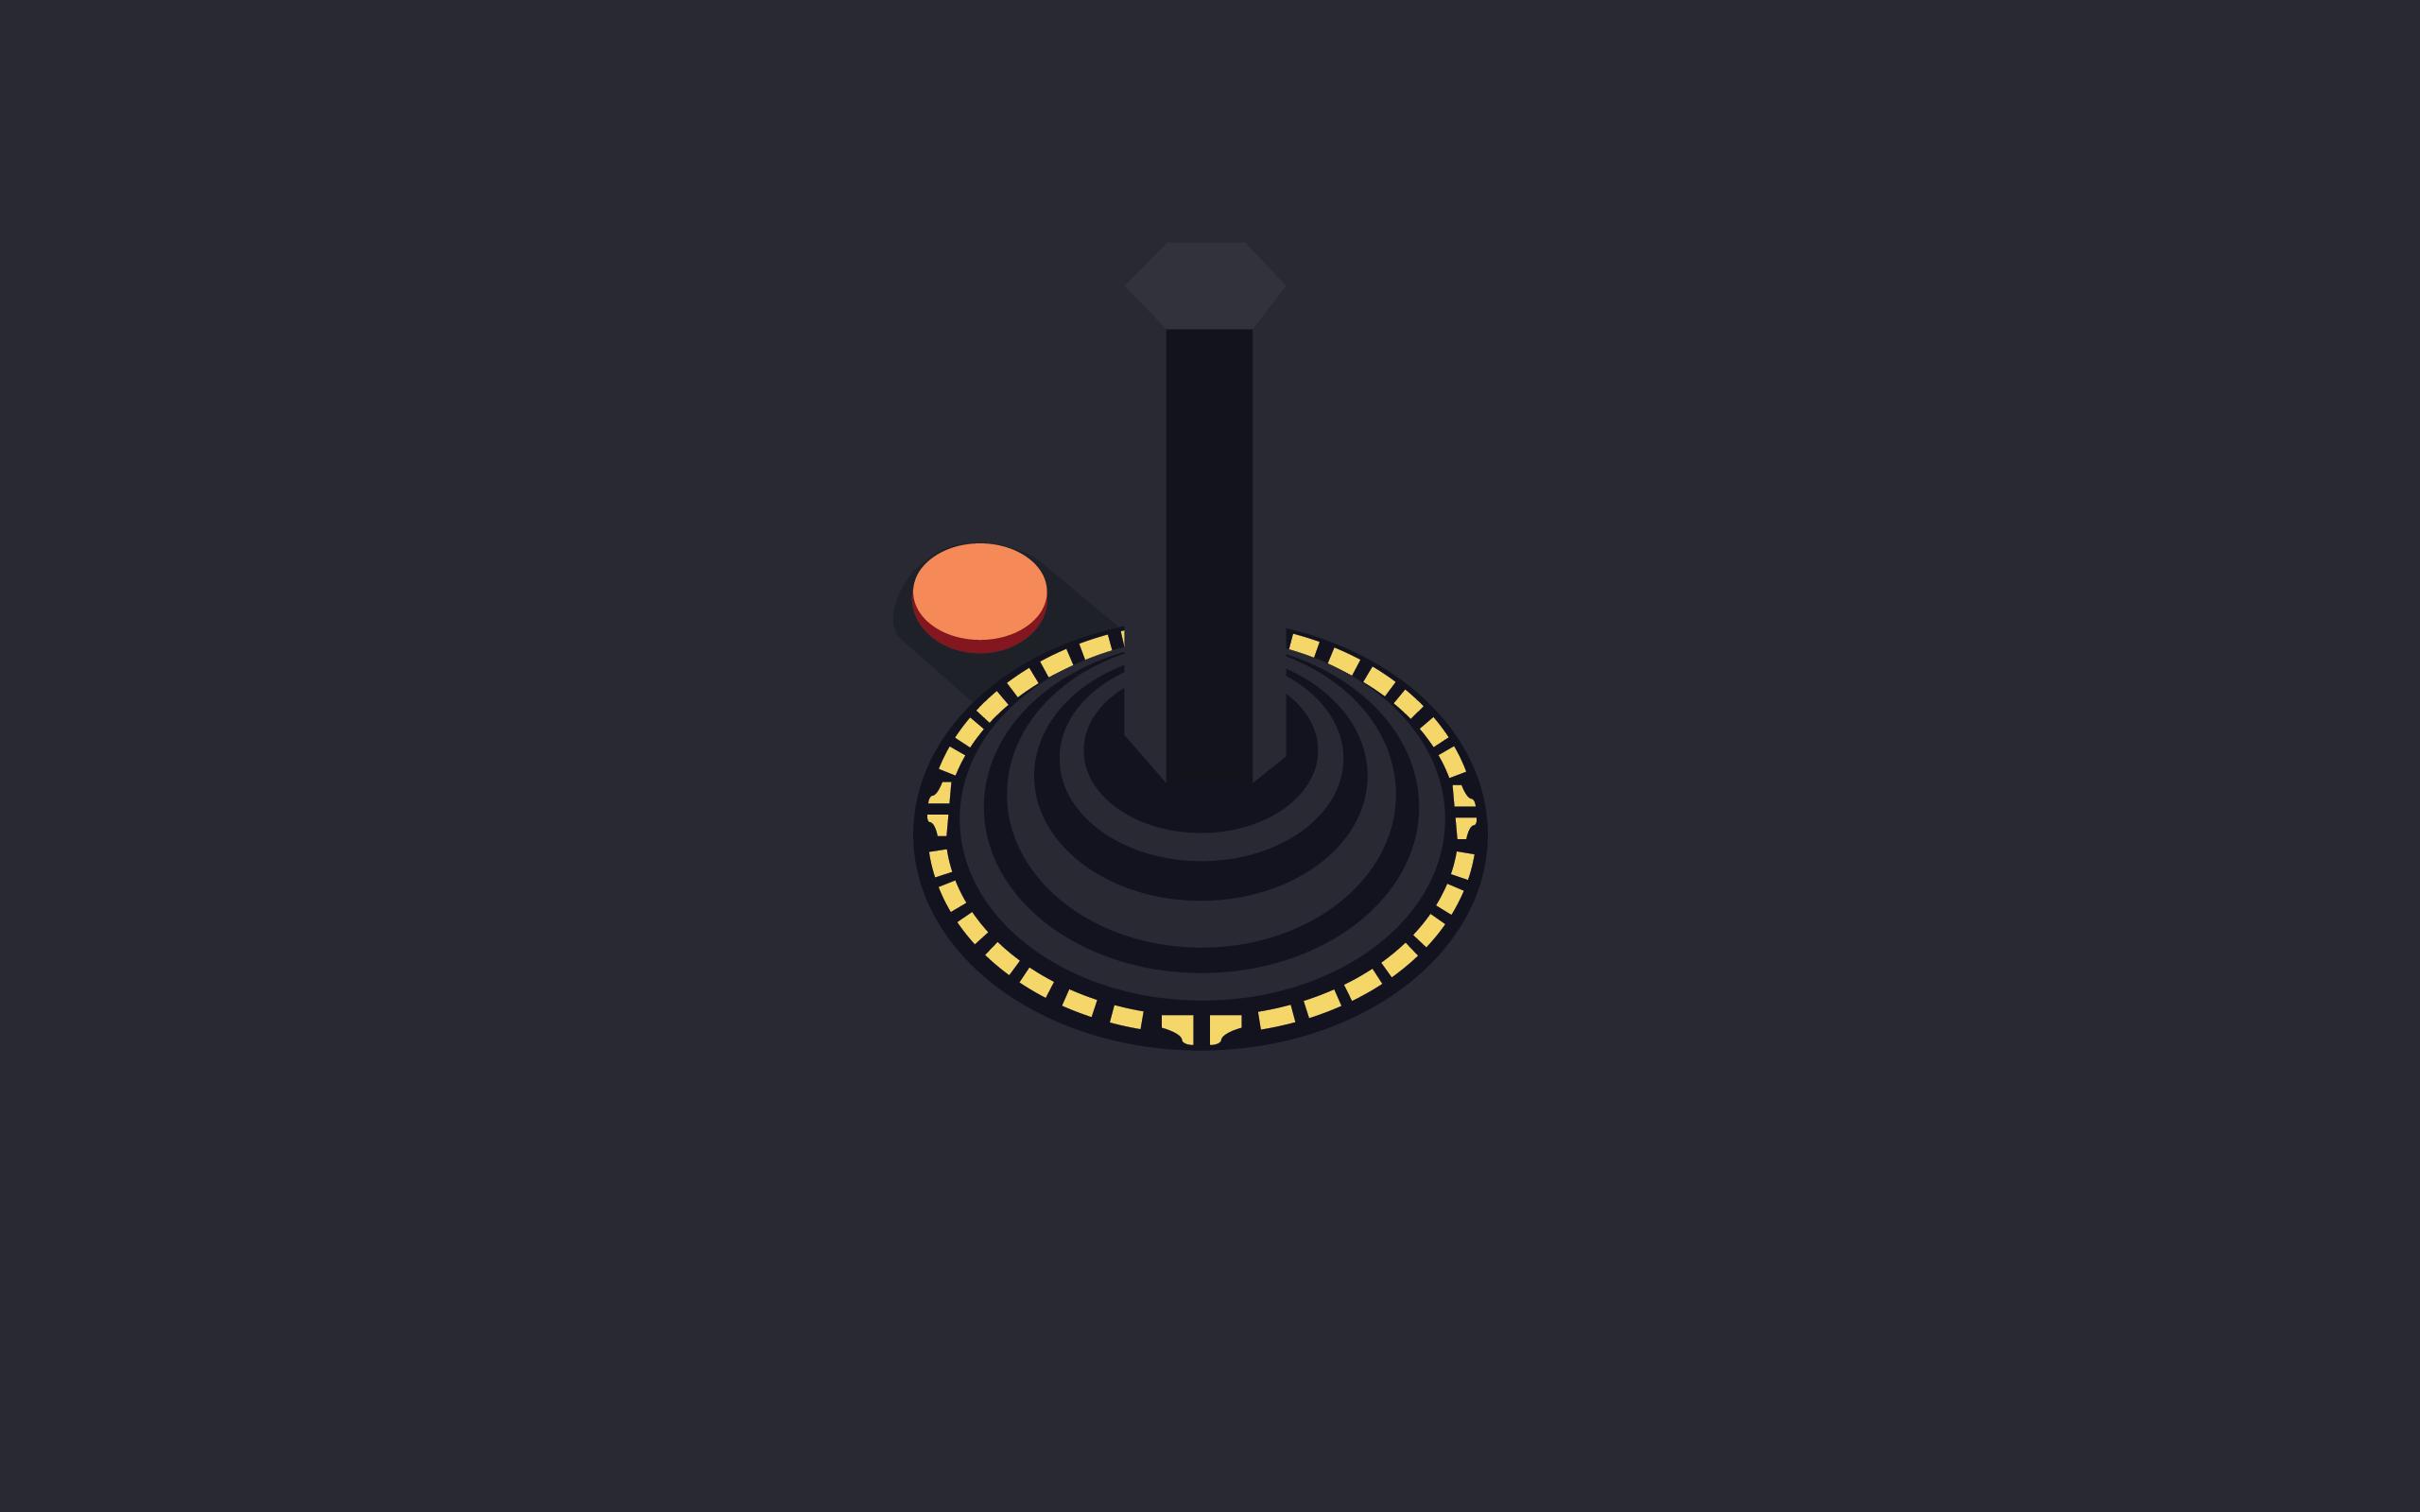 General 2560x1600 joystick Atari video games minimalism retro games buttons simple background